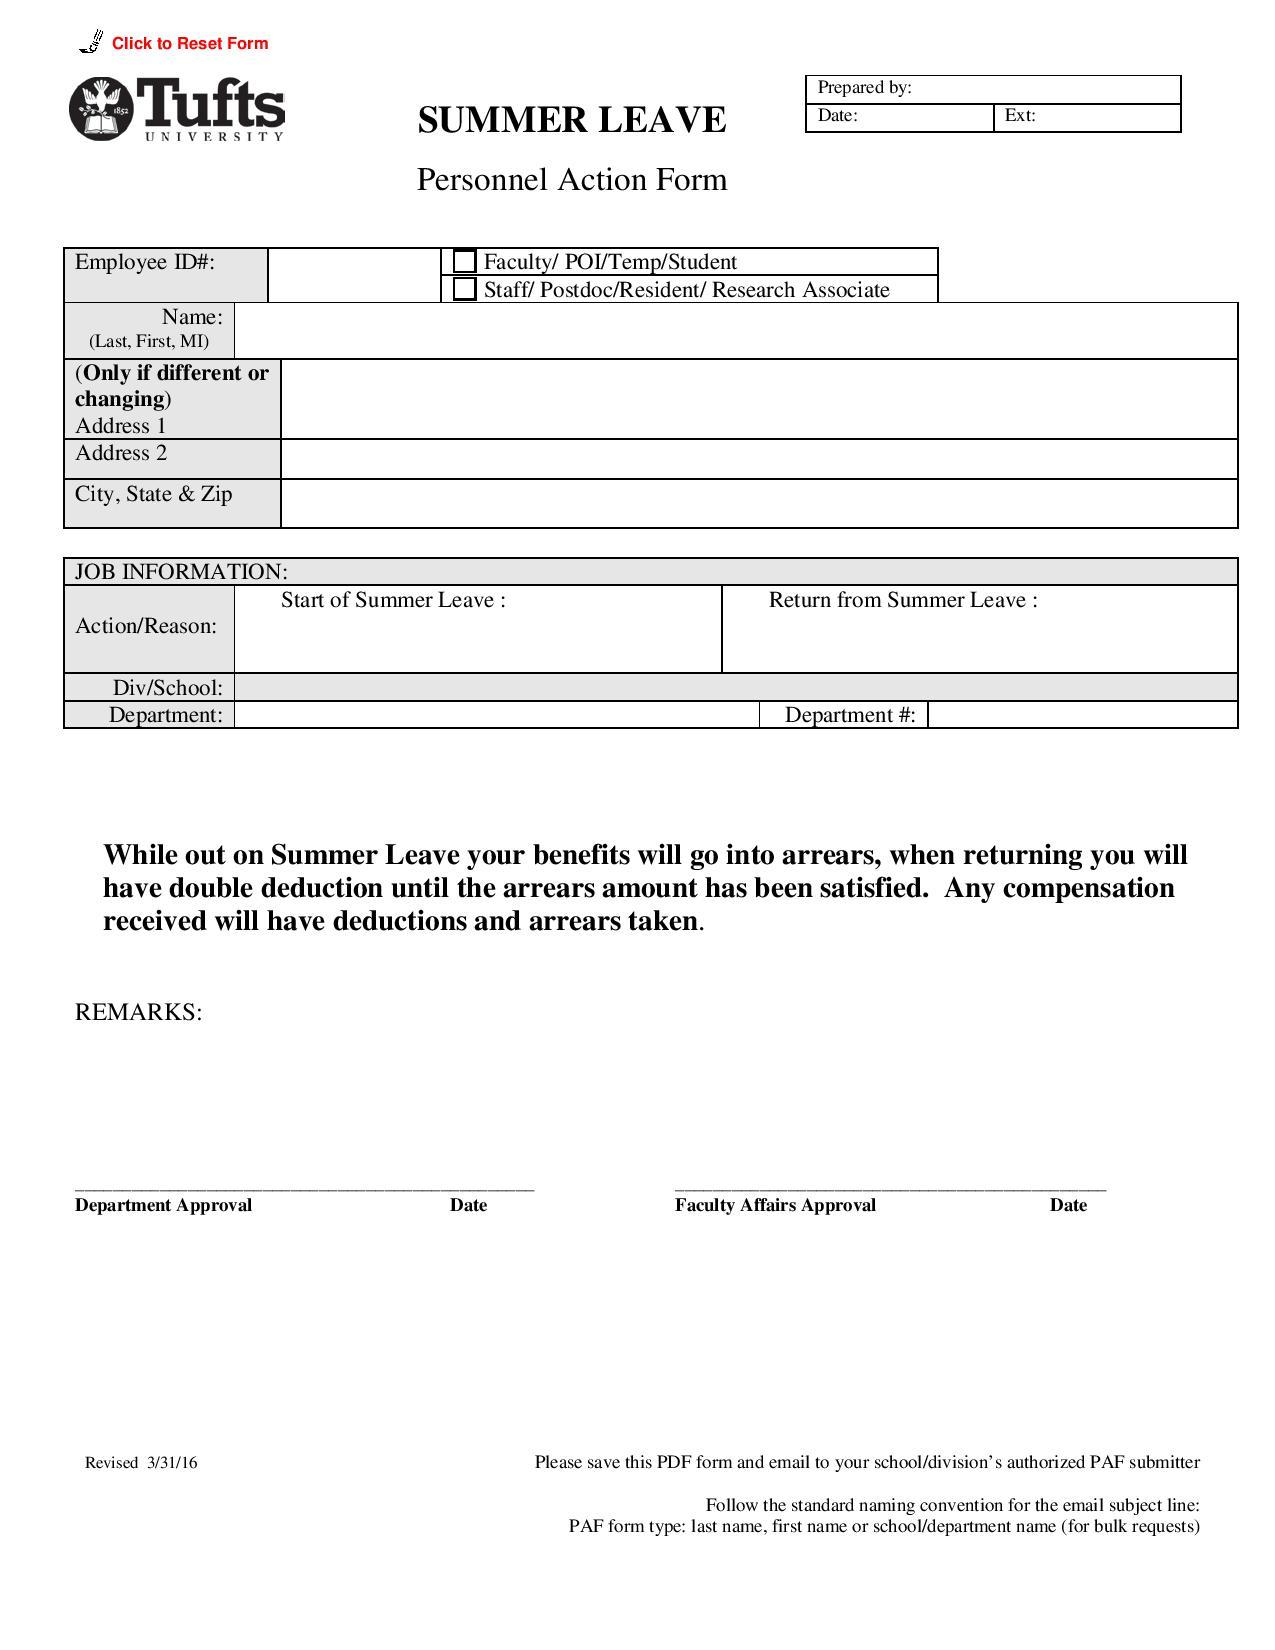 summer leave personnel action form